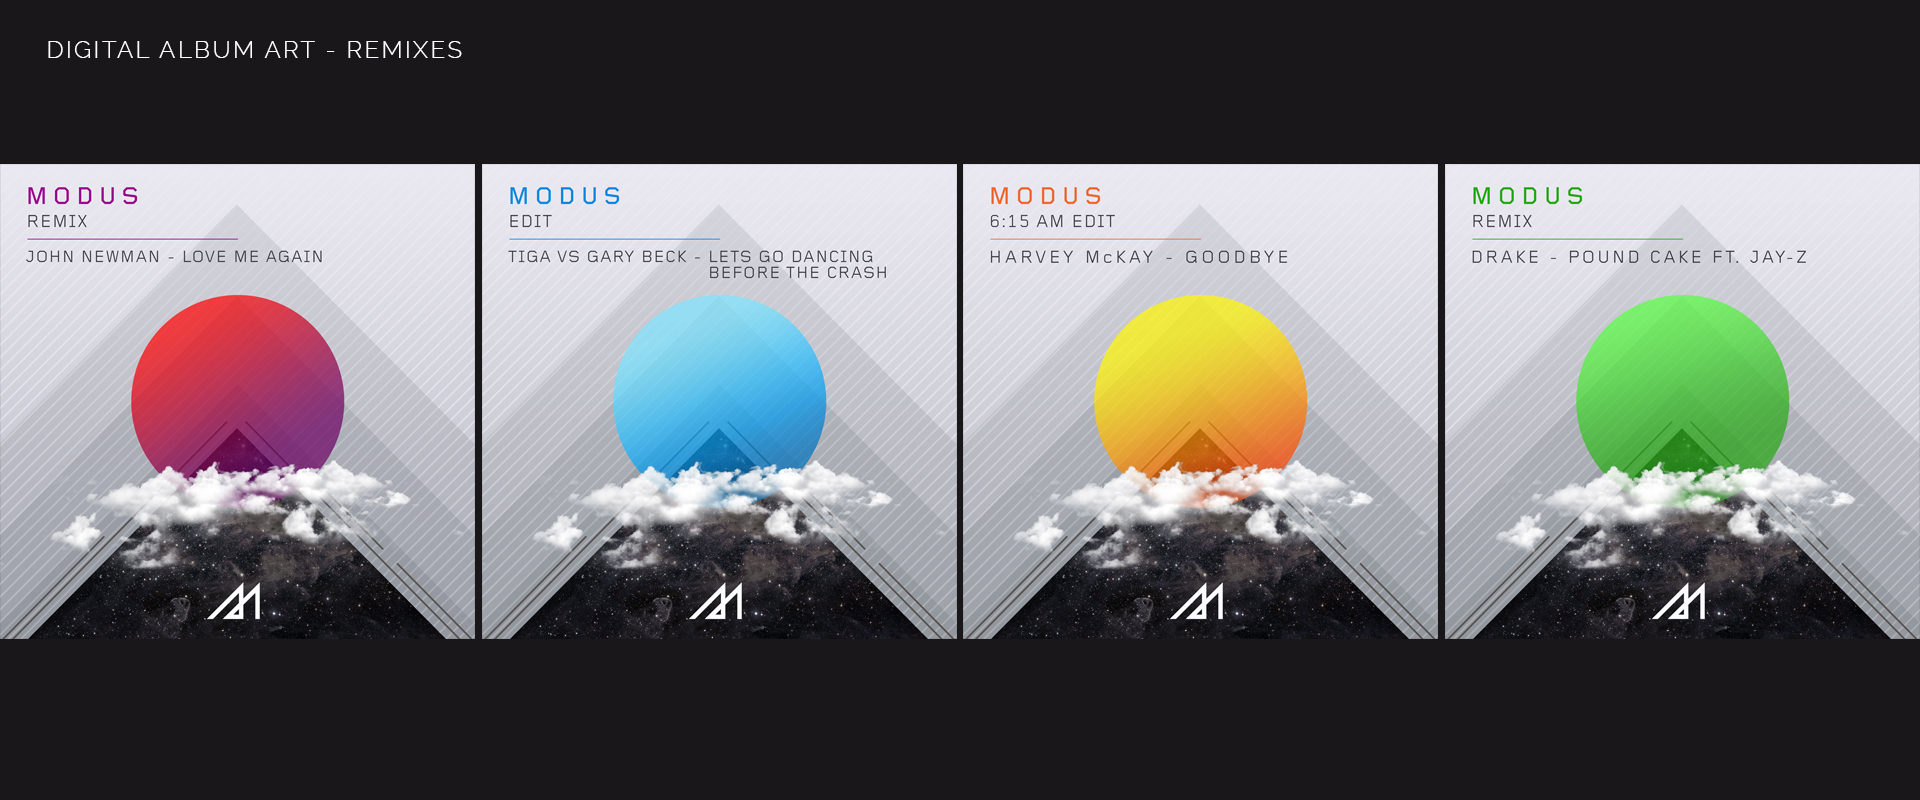 modus_digitalalbumart_remixes_01.jpg